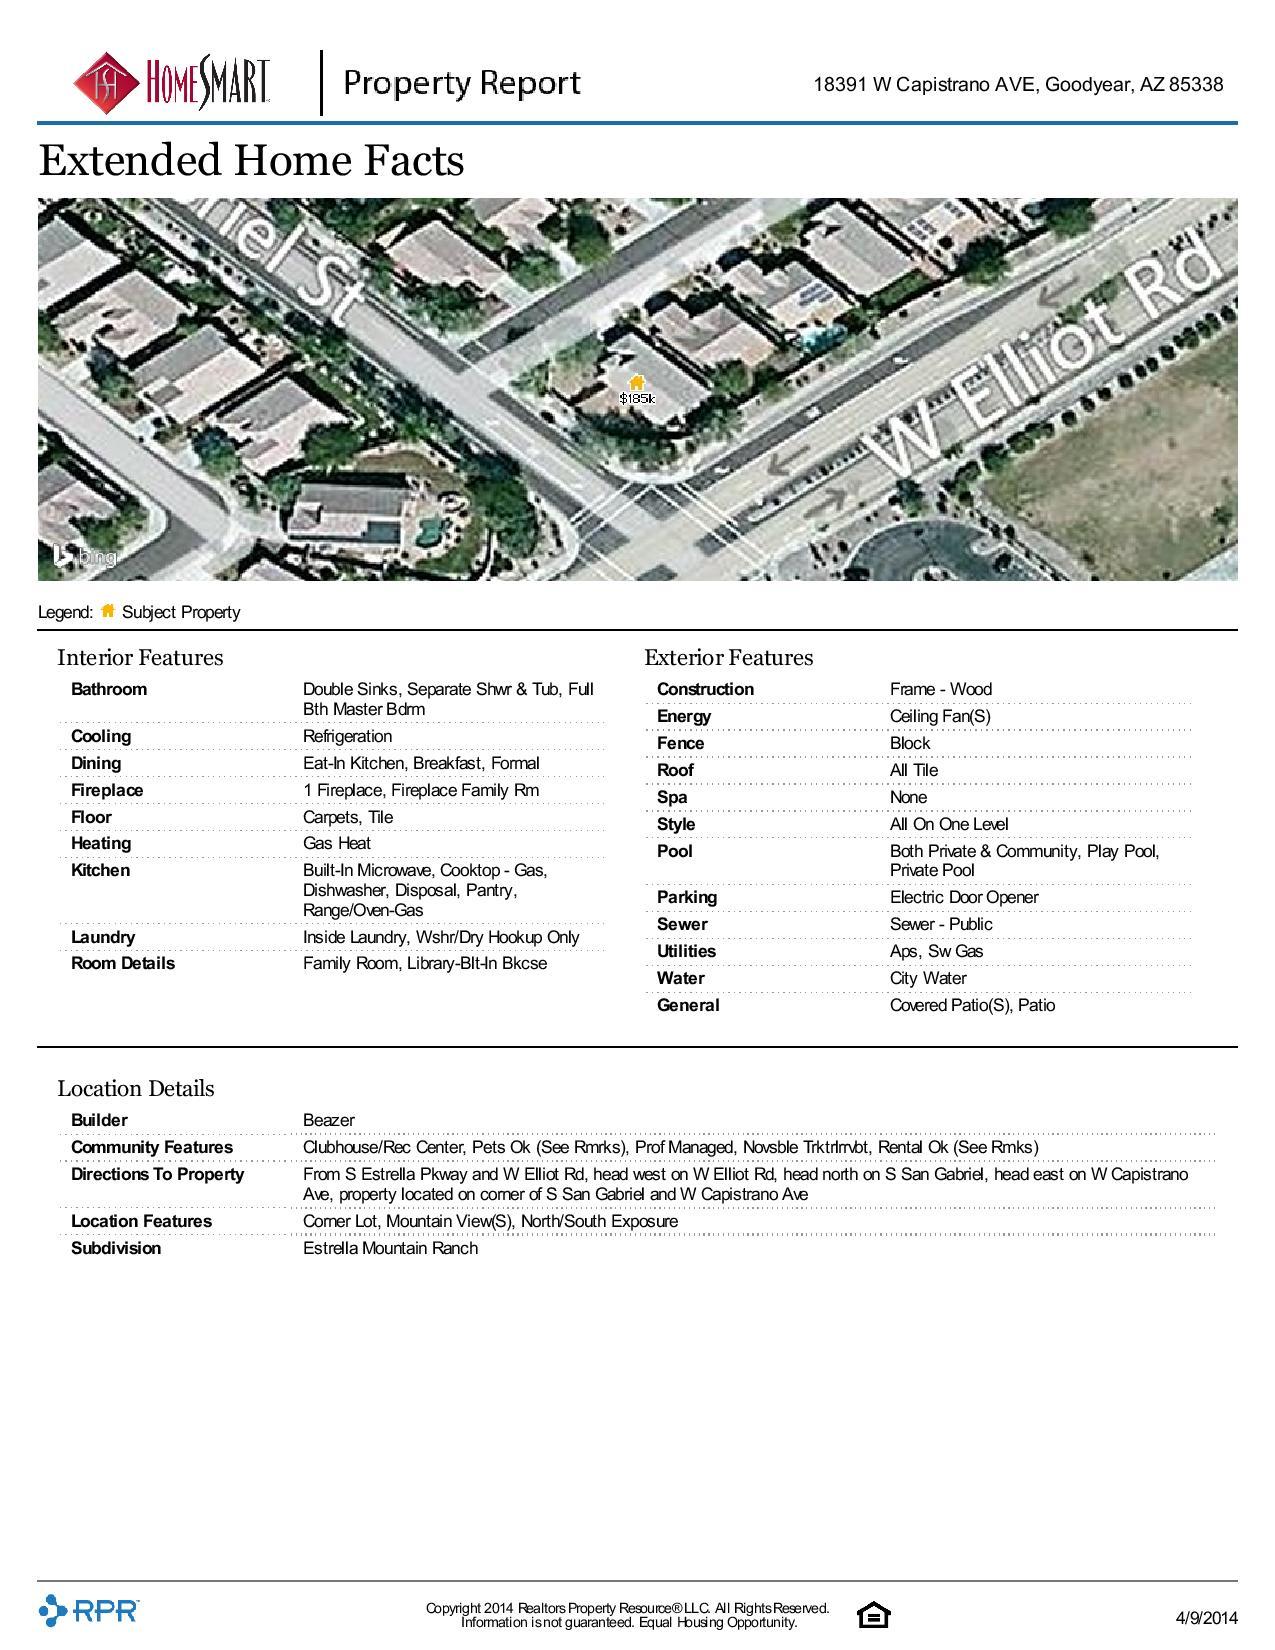 18391-W-Capistrano-AVE-Goodyear-AZ-85338-page-004